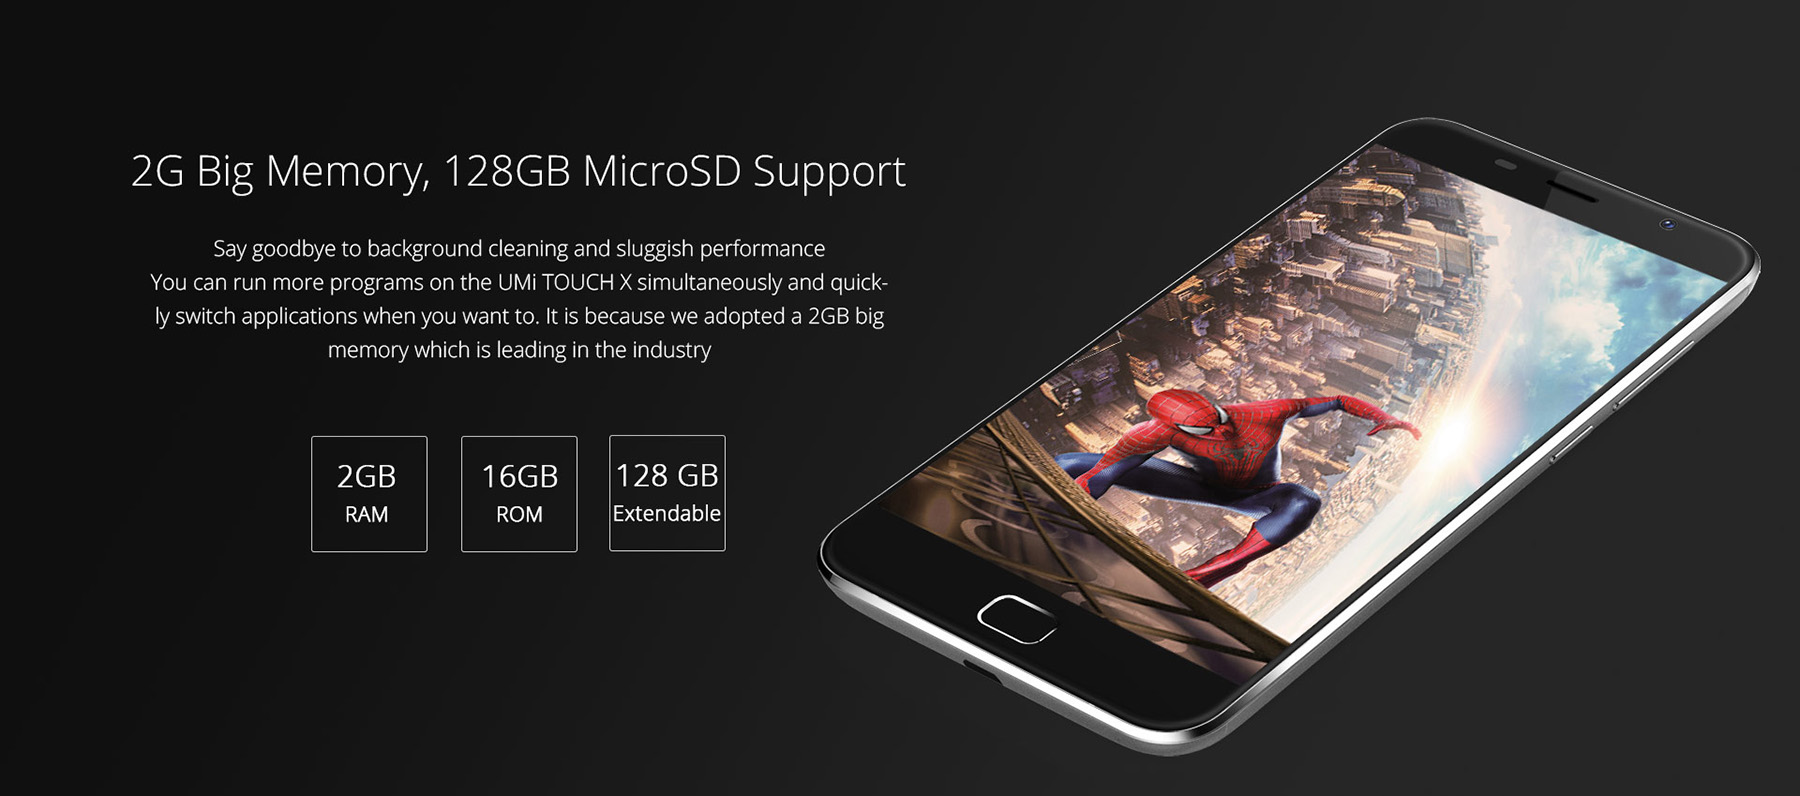 UMI TOUCH X, Display Full HD randlos, Preisvergleich Smartphone, Preissuchmaschine China